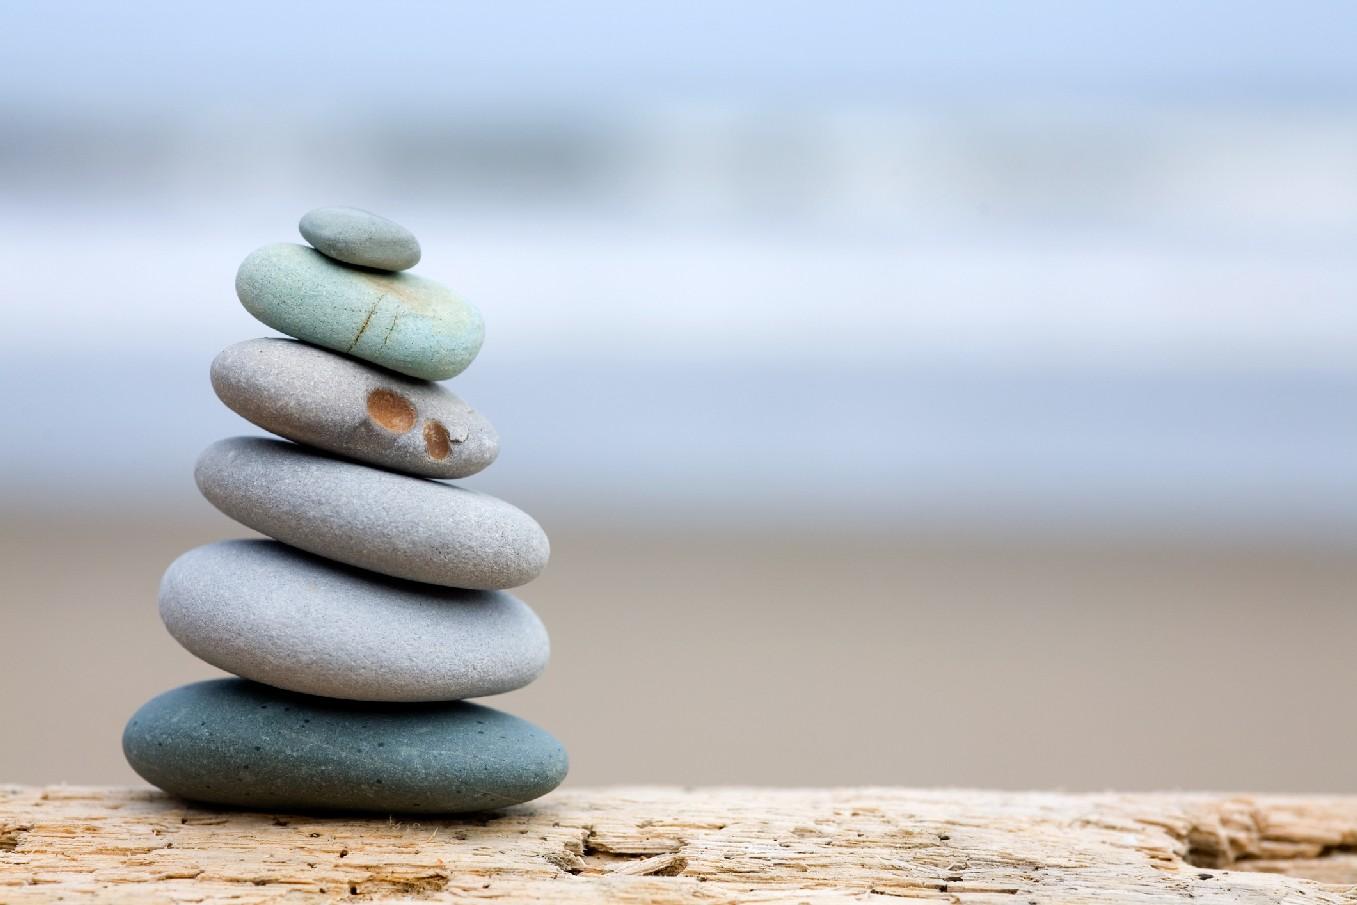 Balancing_rocks.jpg